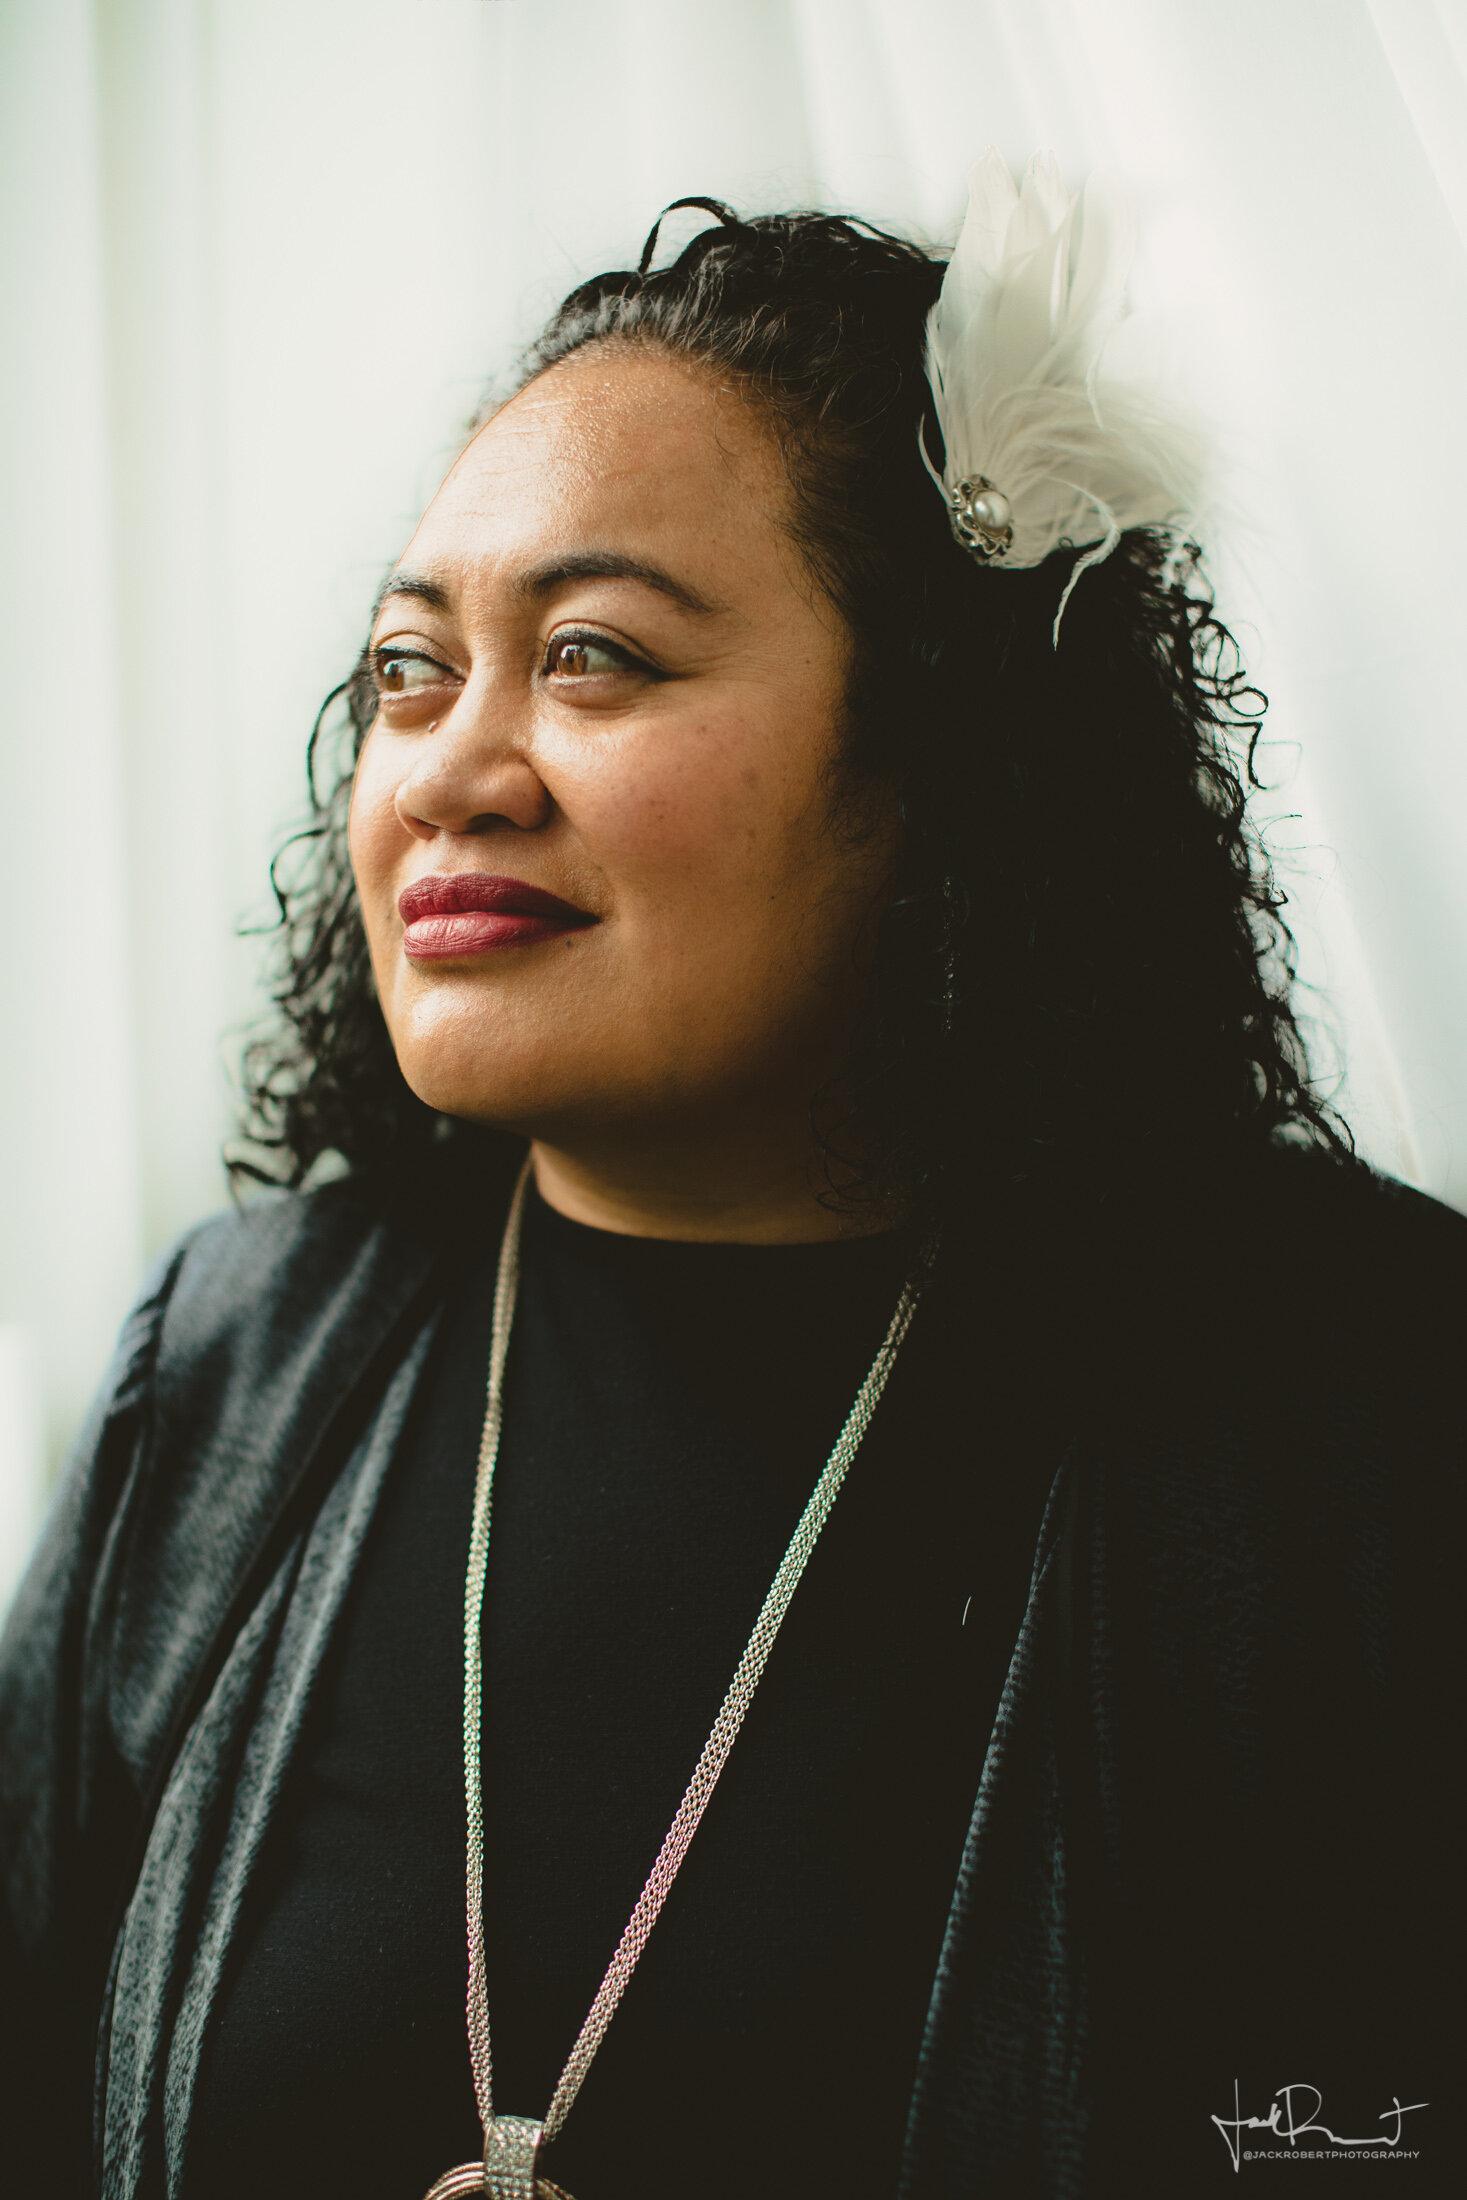 Portrait Session - International Award Winning Opera Singer Aivale Cole - London, United Kingdom  - Jack Robert Photography